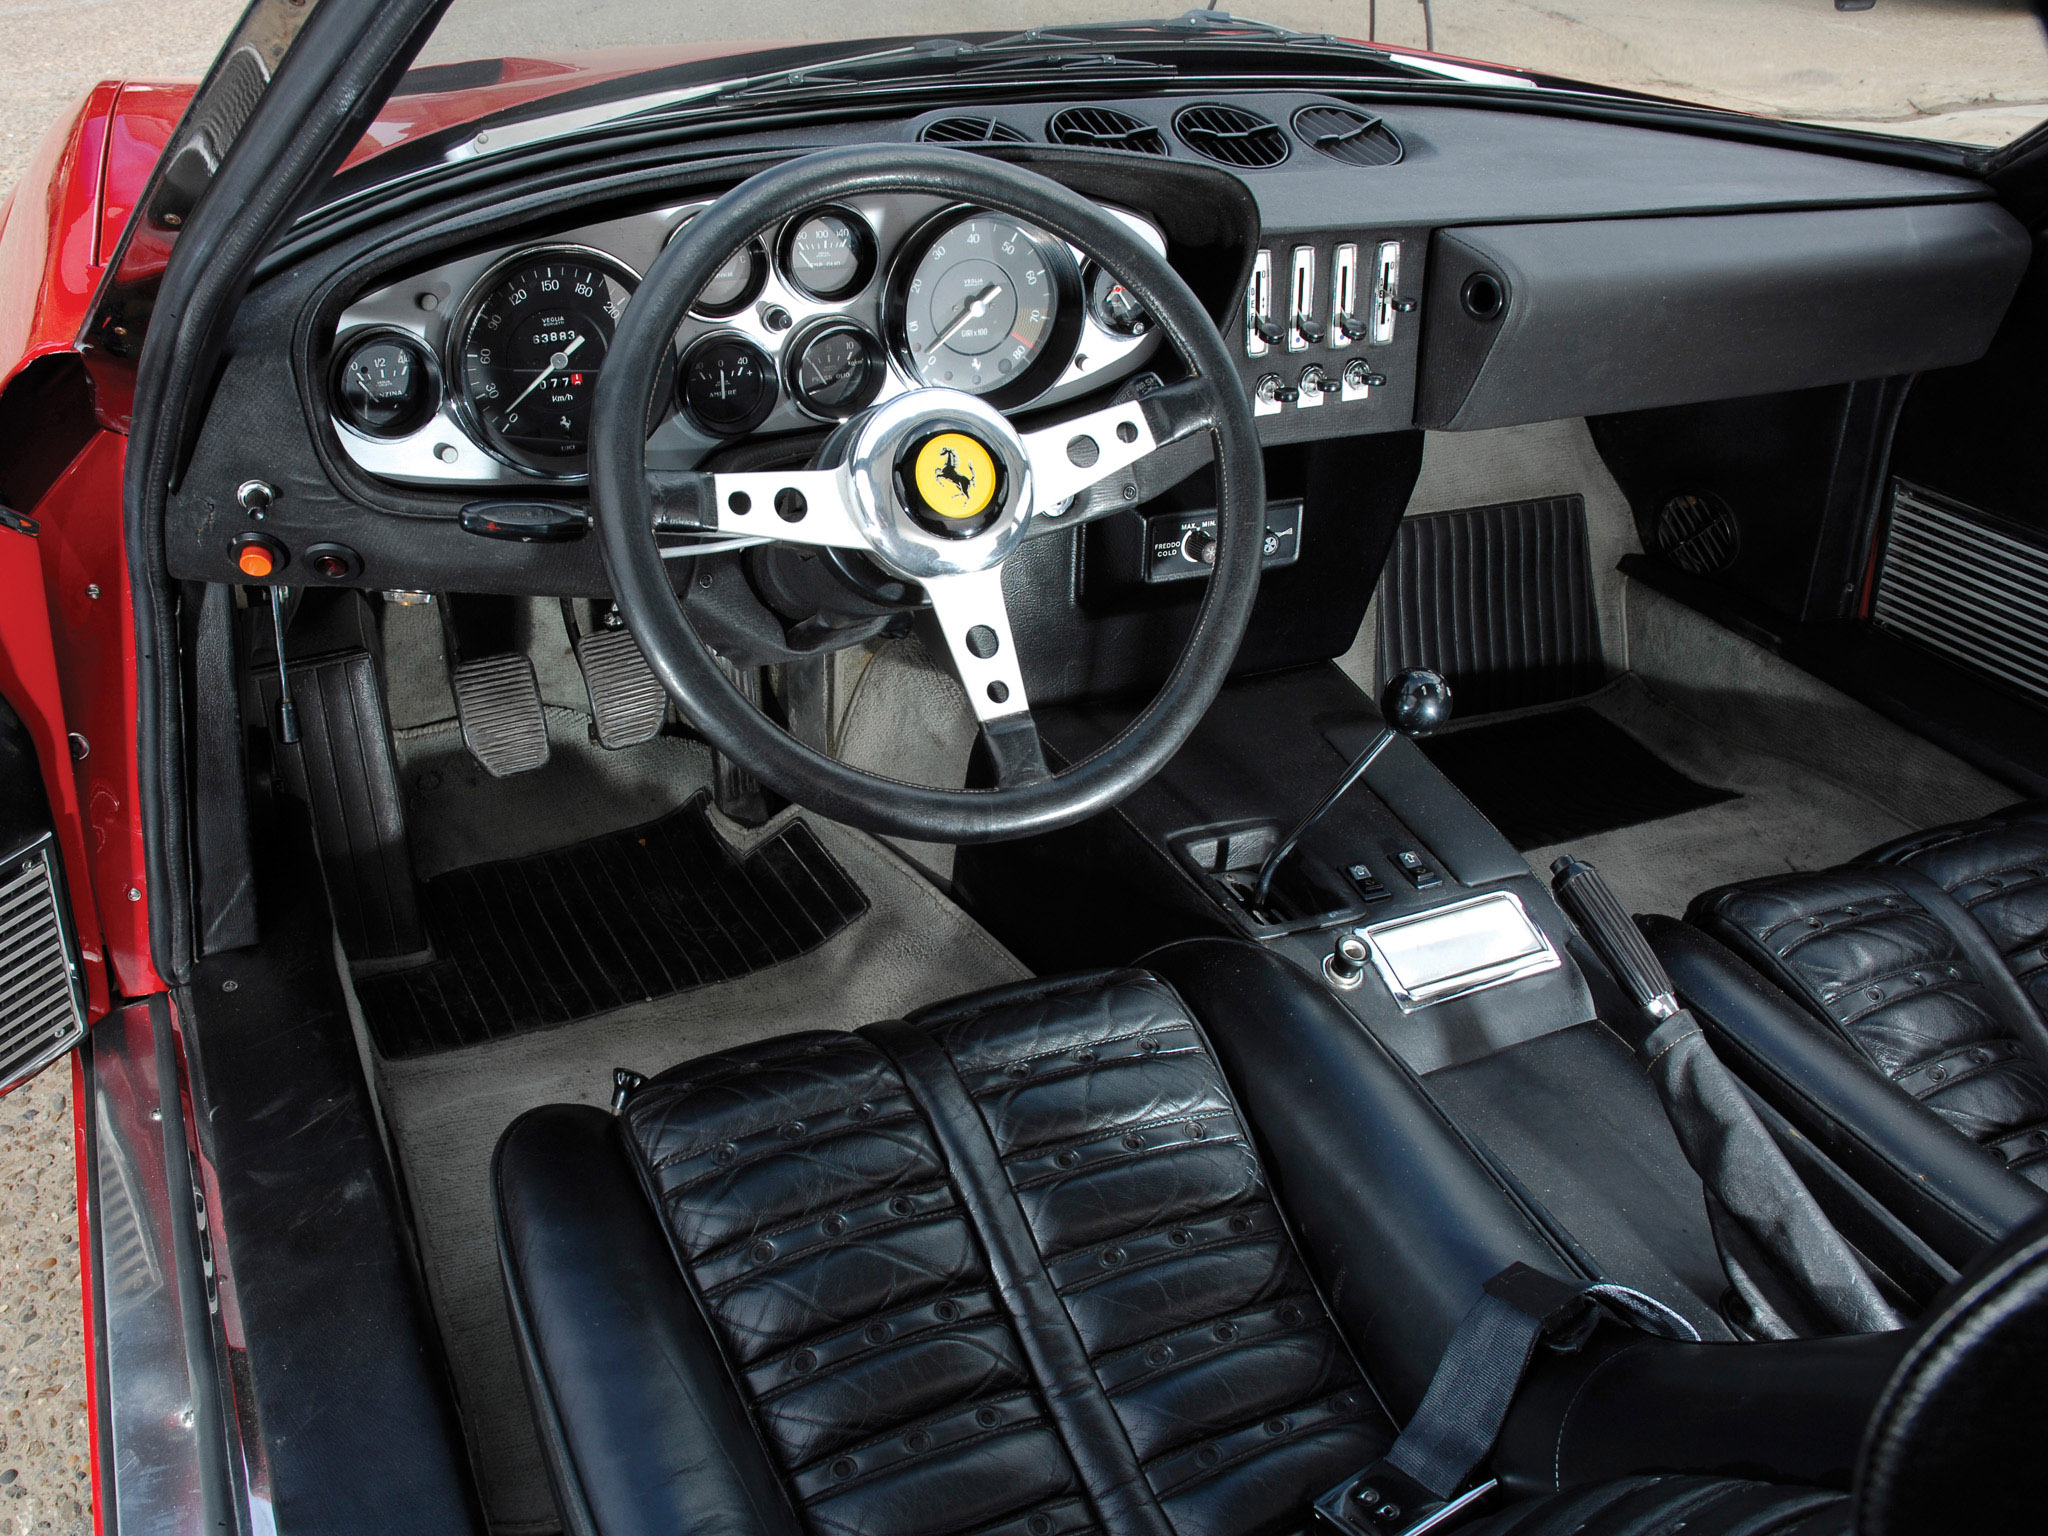 1971 73 Ferrari 365 GTB4 Daytona Supercar Interior H